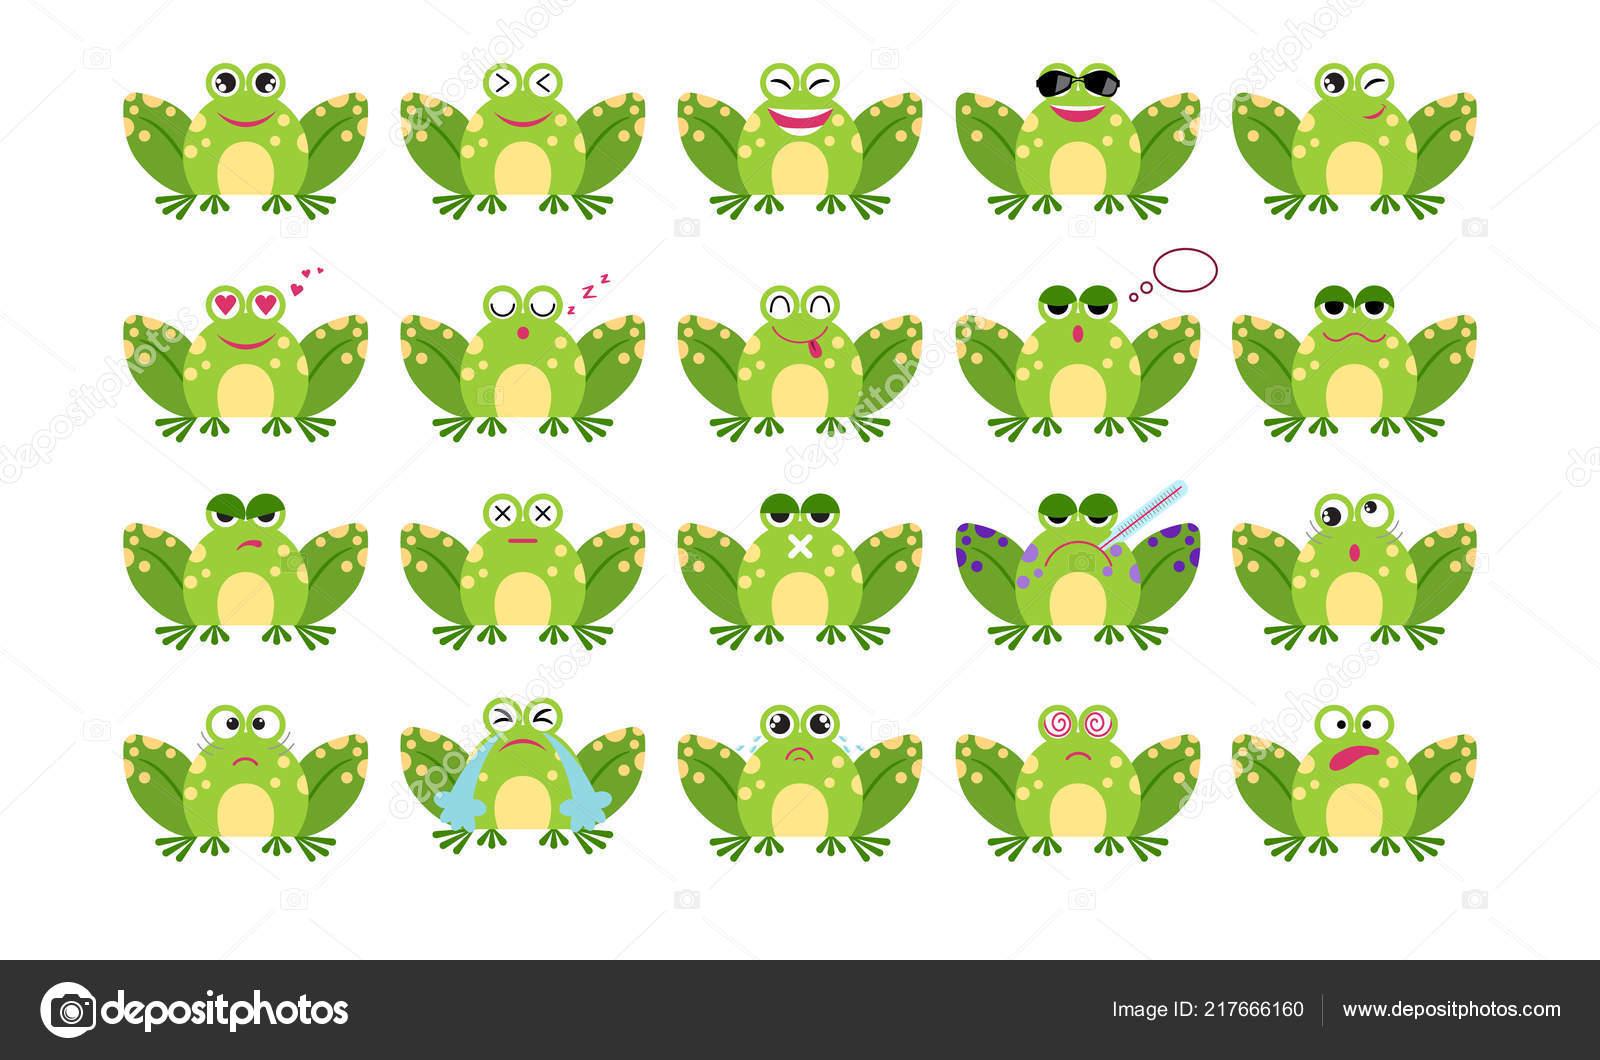 Conjunto Emoticon Sapo Engraçado Dos Desenhos Animados